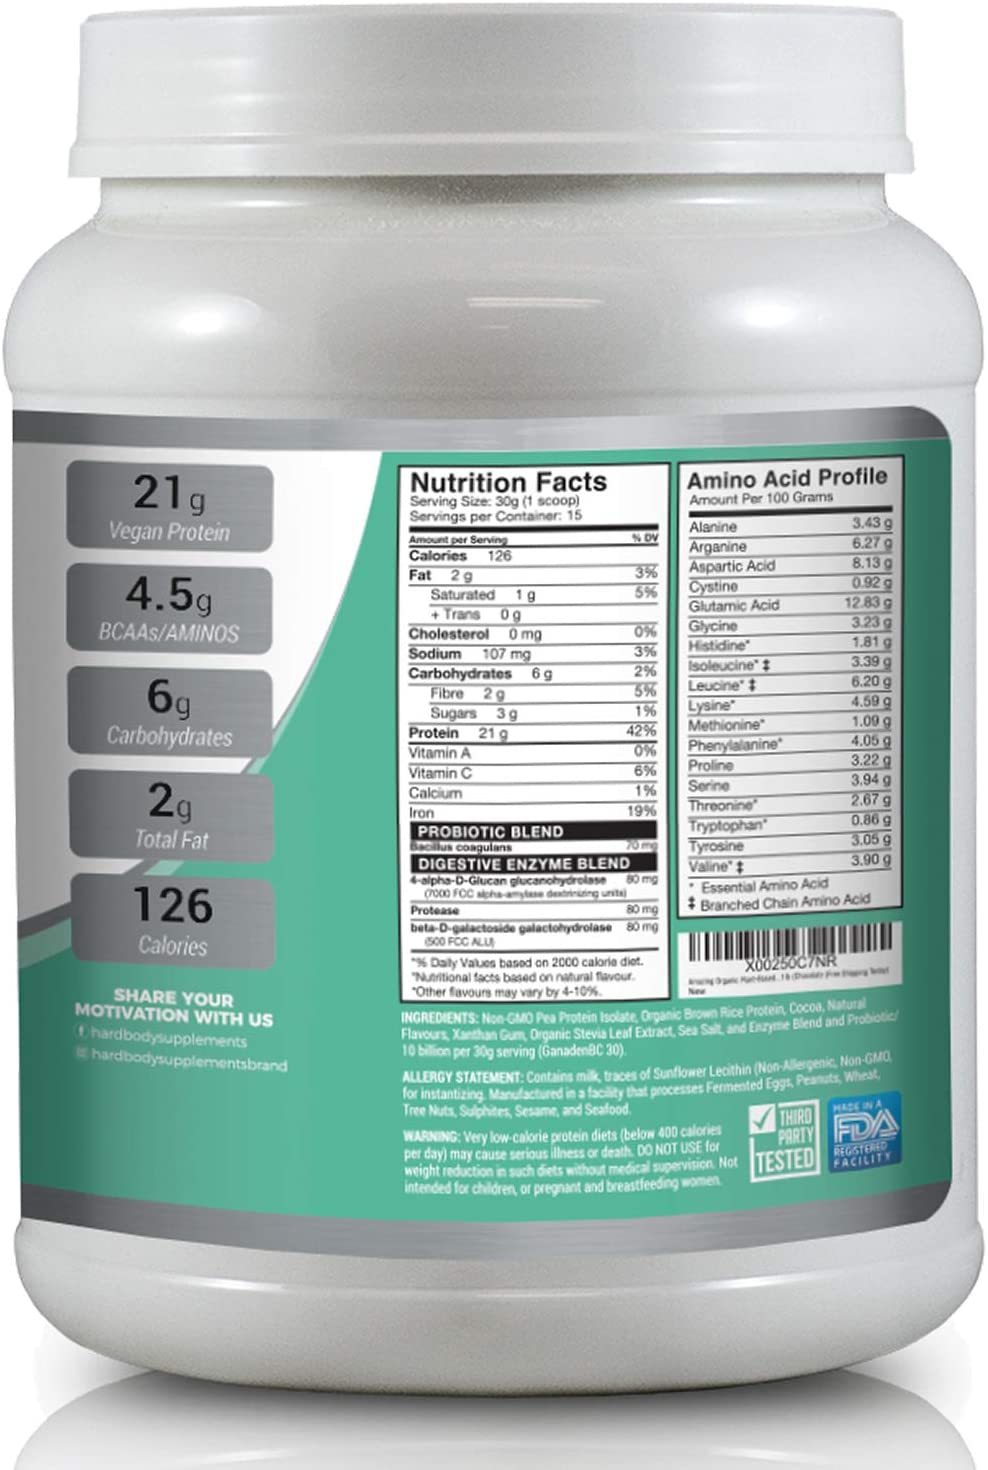 Asombrosas Orgánicas base de plantas Vegana Polvo de Proteína : el mejor polvo de proteína vegana para hombres y mujeres (Chocolate Bliss, 15 Serving)